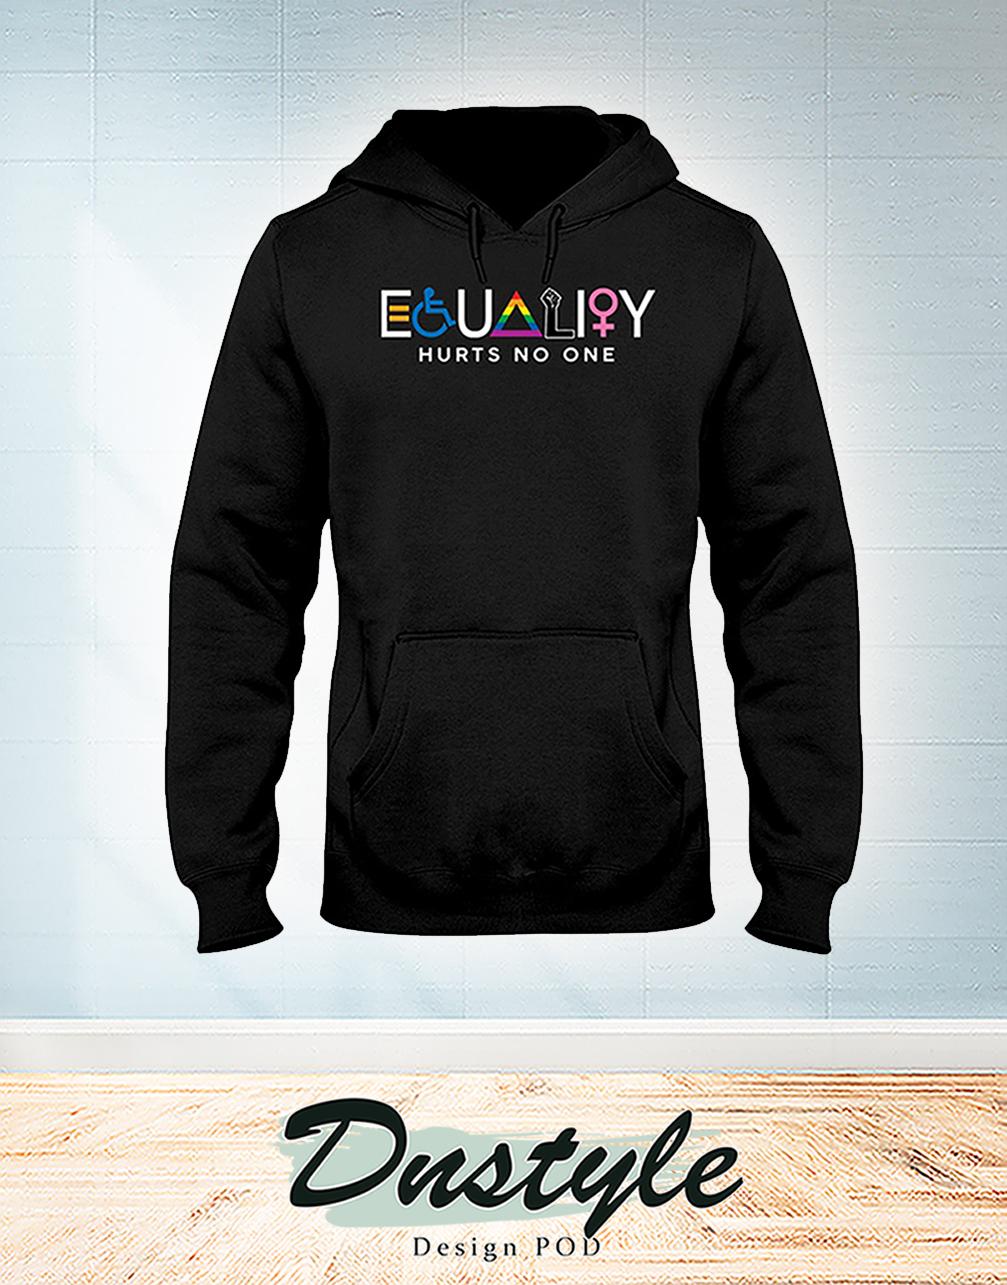 Equality hurts no one hoodie